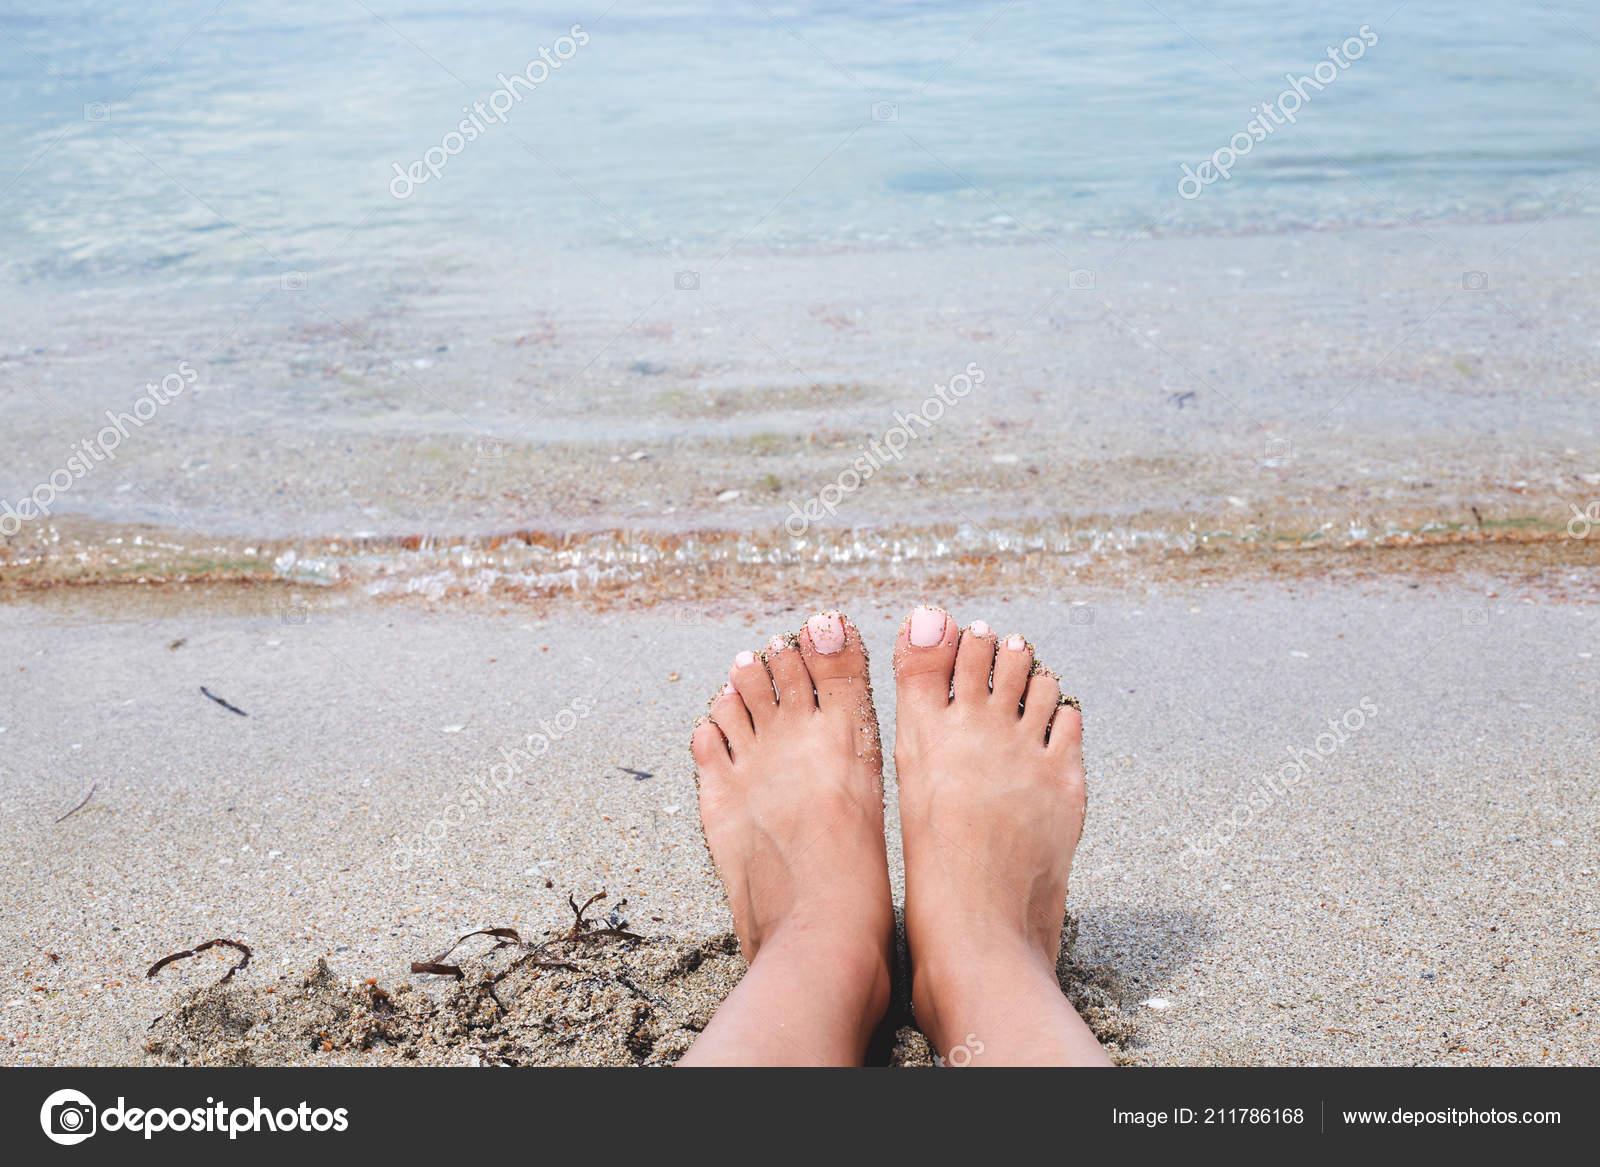 00a9a3f04a Υγρά Γυναικεία Πόδια Στην Παραλία Και Άμμο — Φωτογραφία Αρχείου ...